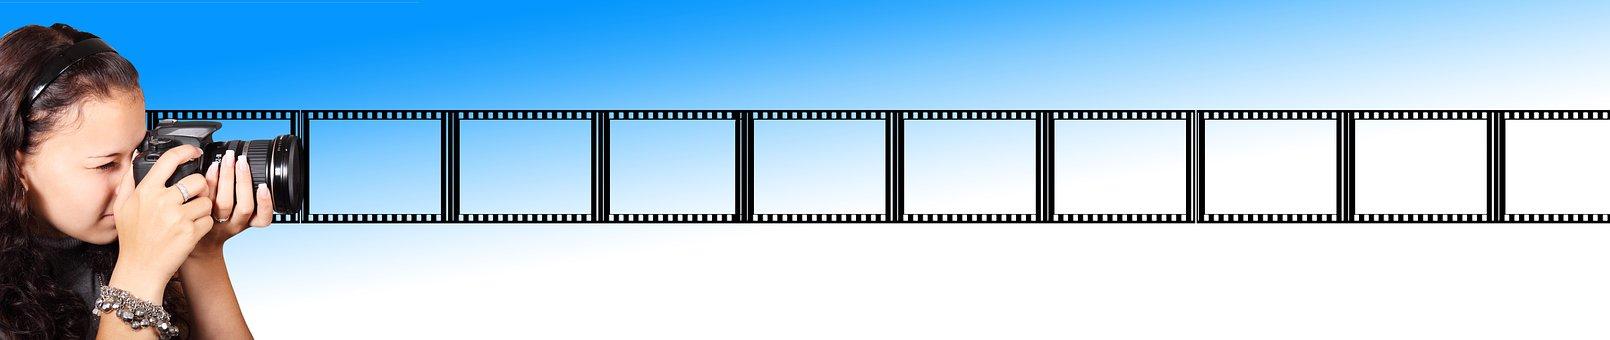 Photographer, Photograph, Camera, Banner, Header, Film